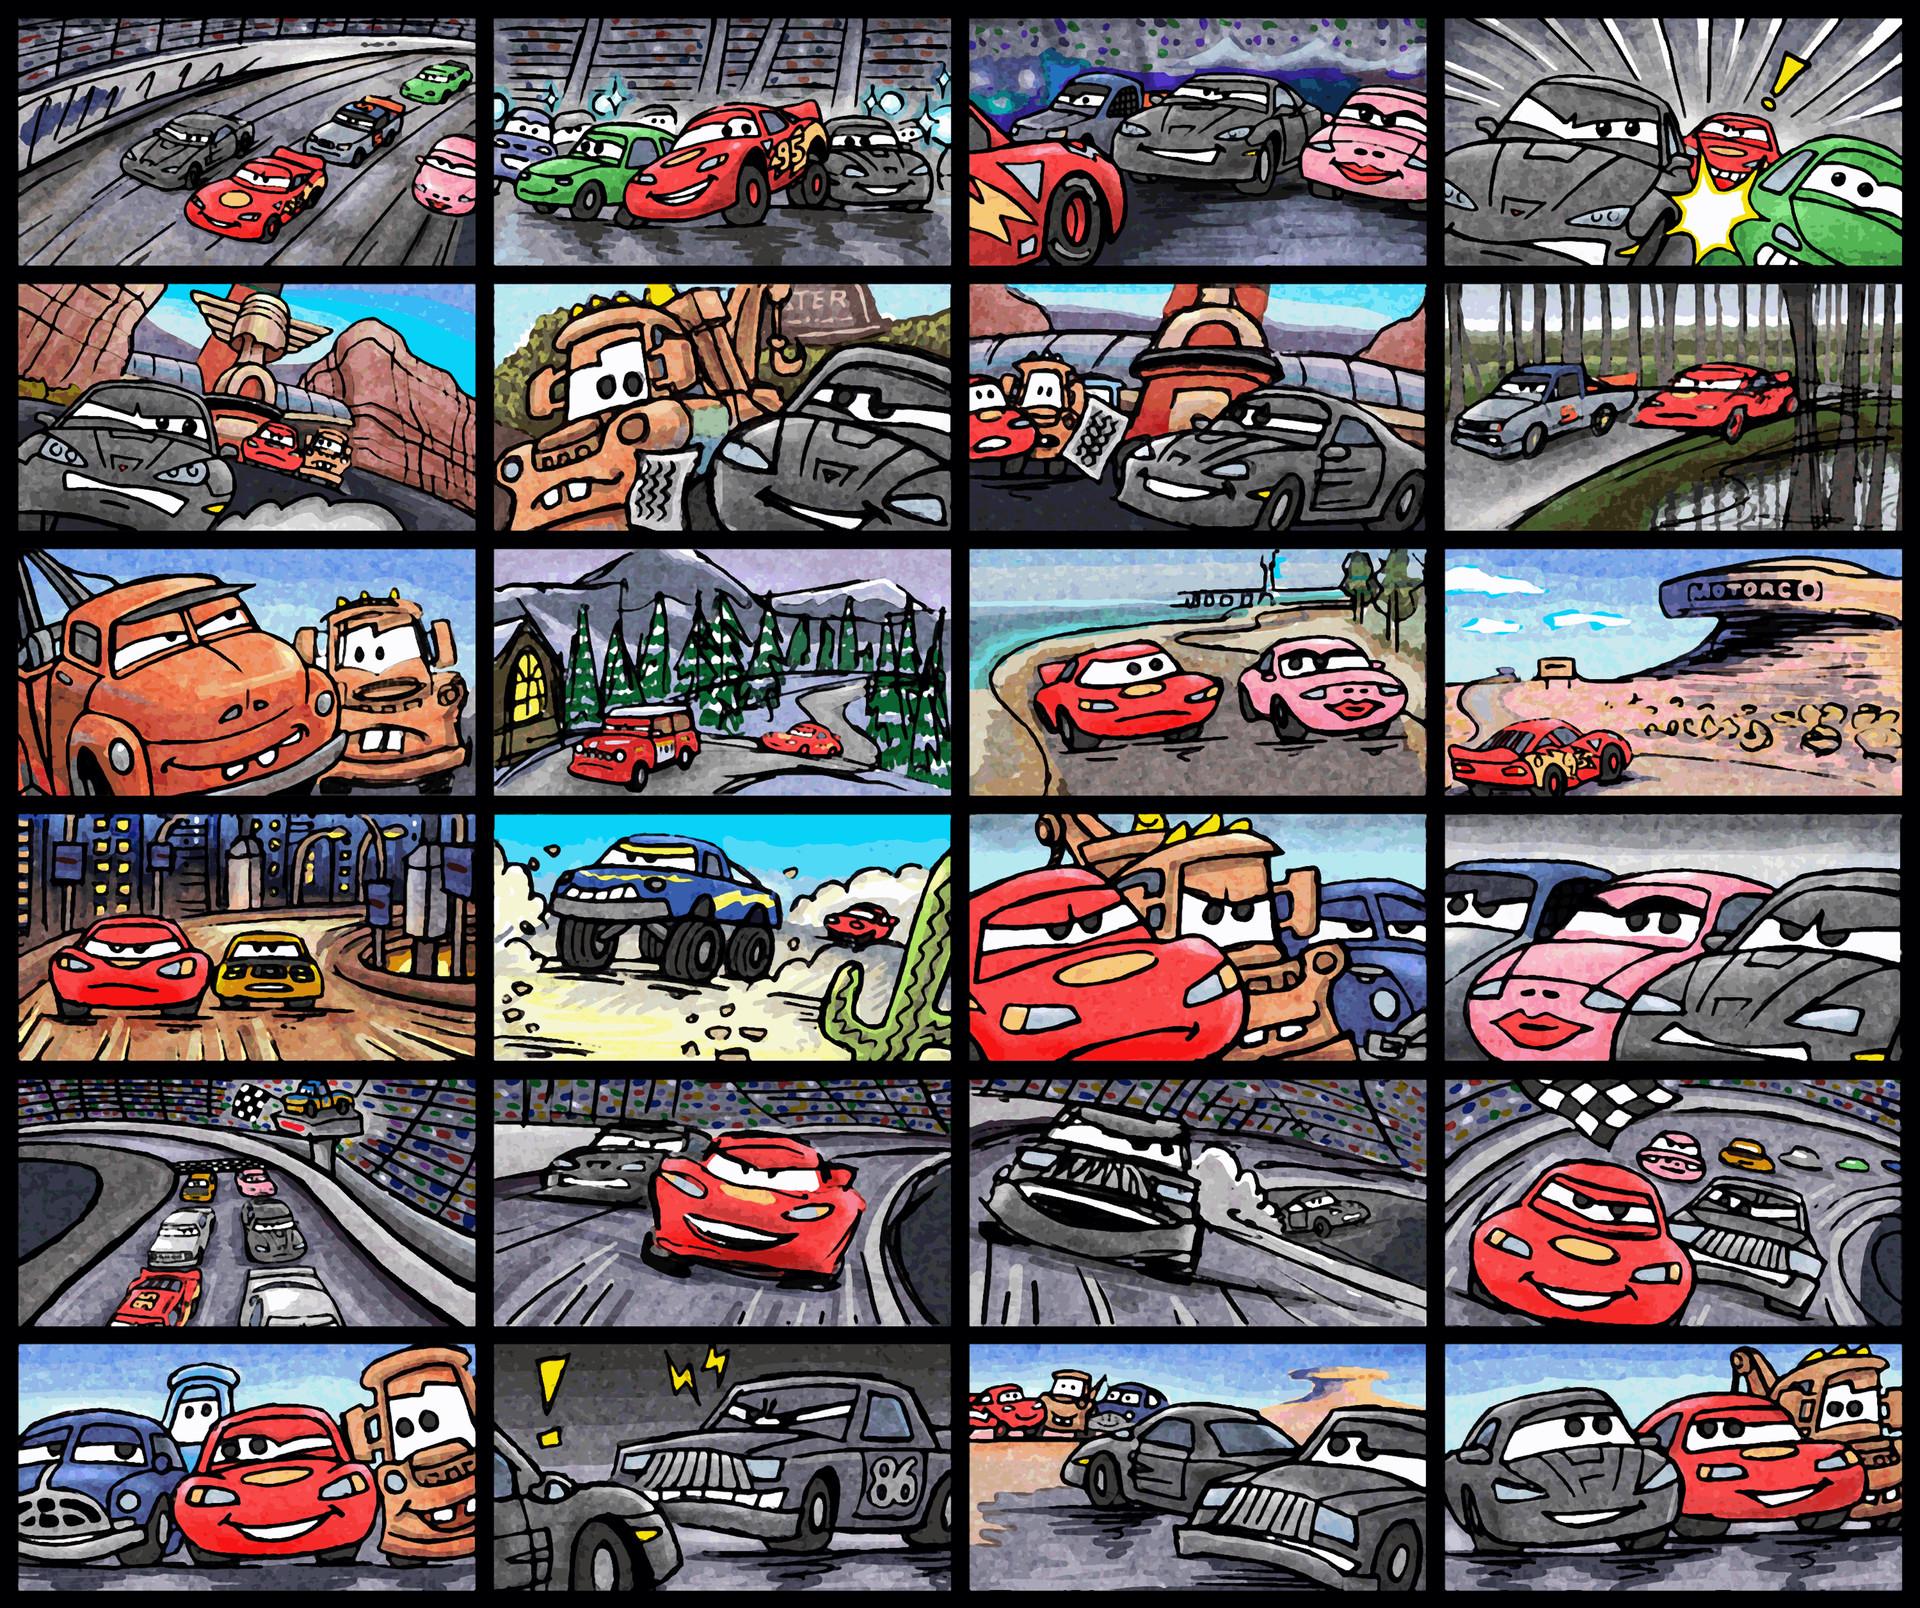 (2009) Storyboard - Cars: Race-O-Rama I